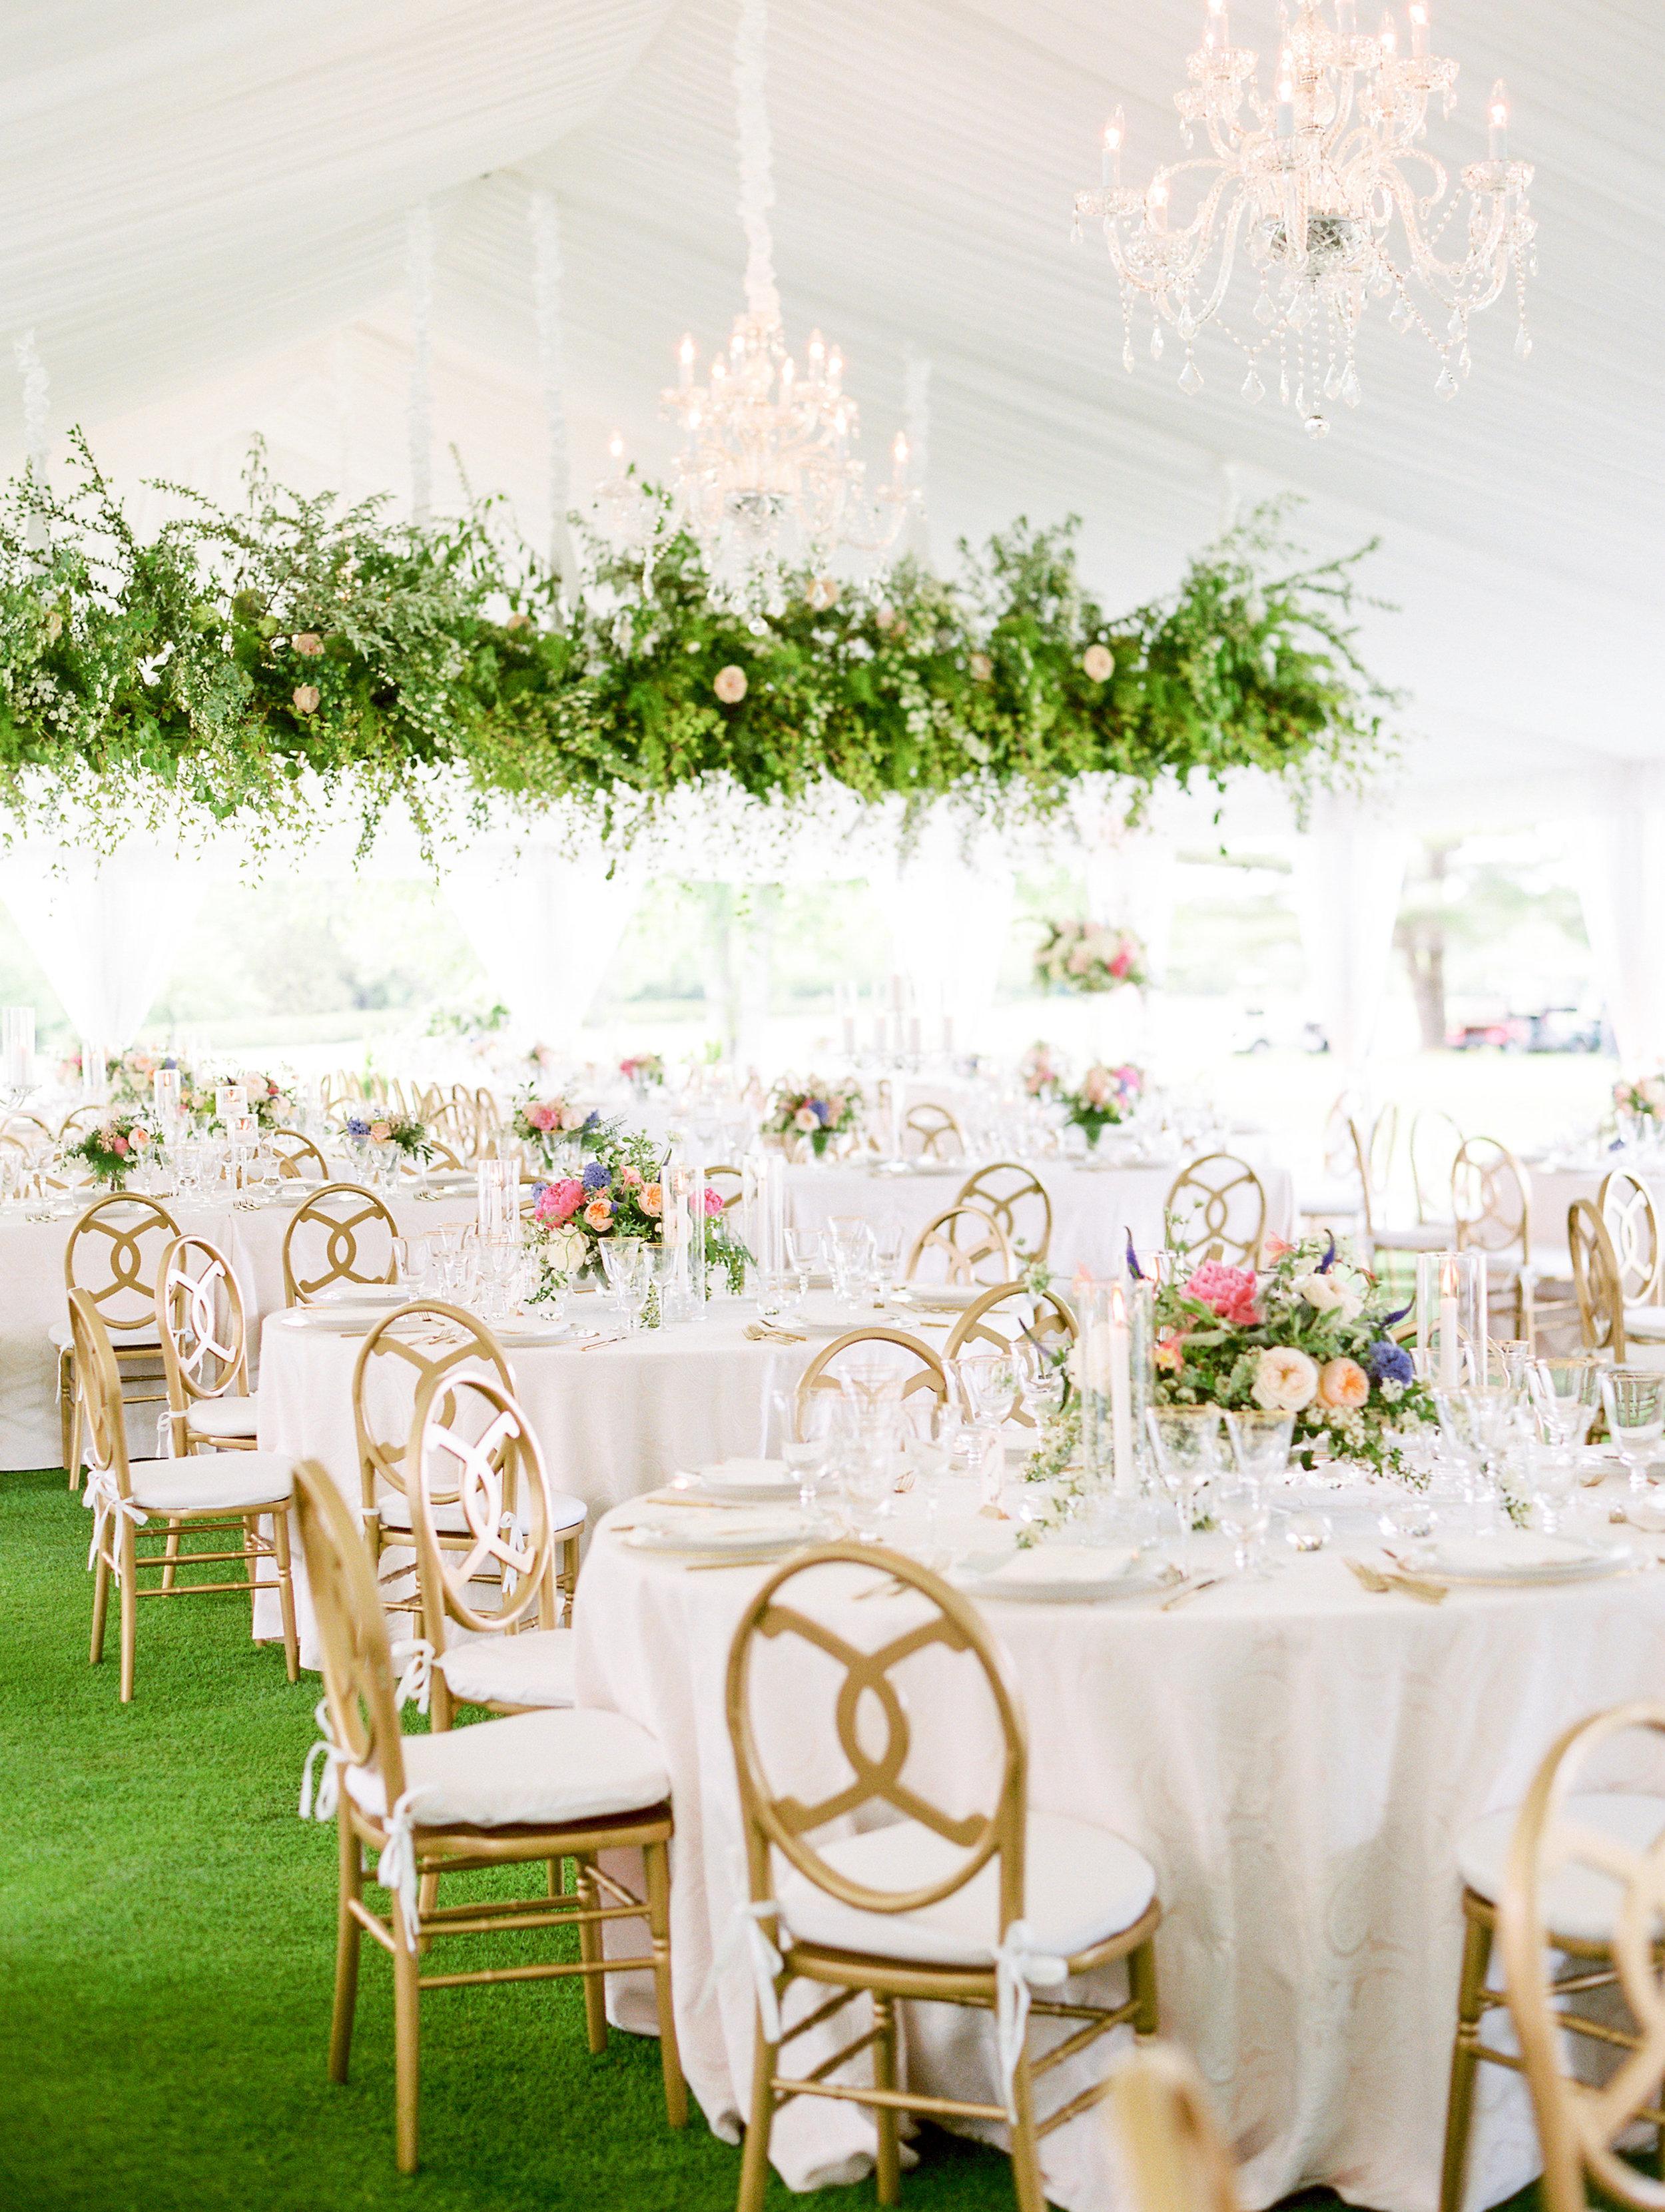 Coffman+Wedding+Reception+Details-95.jpg